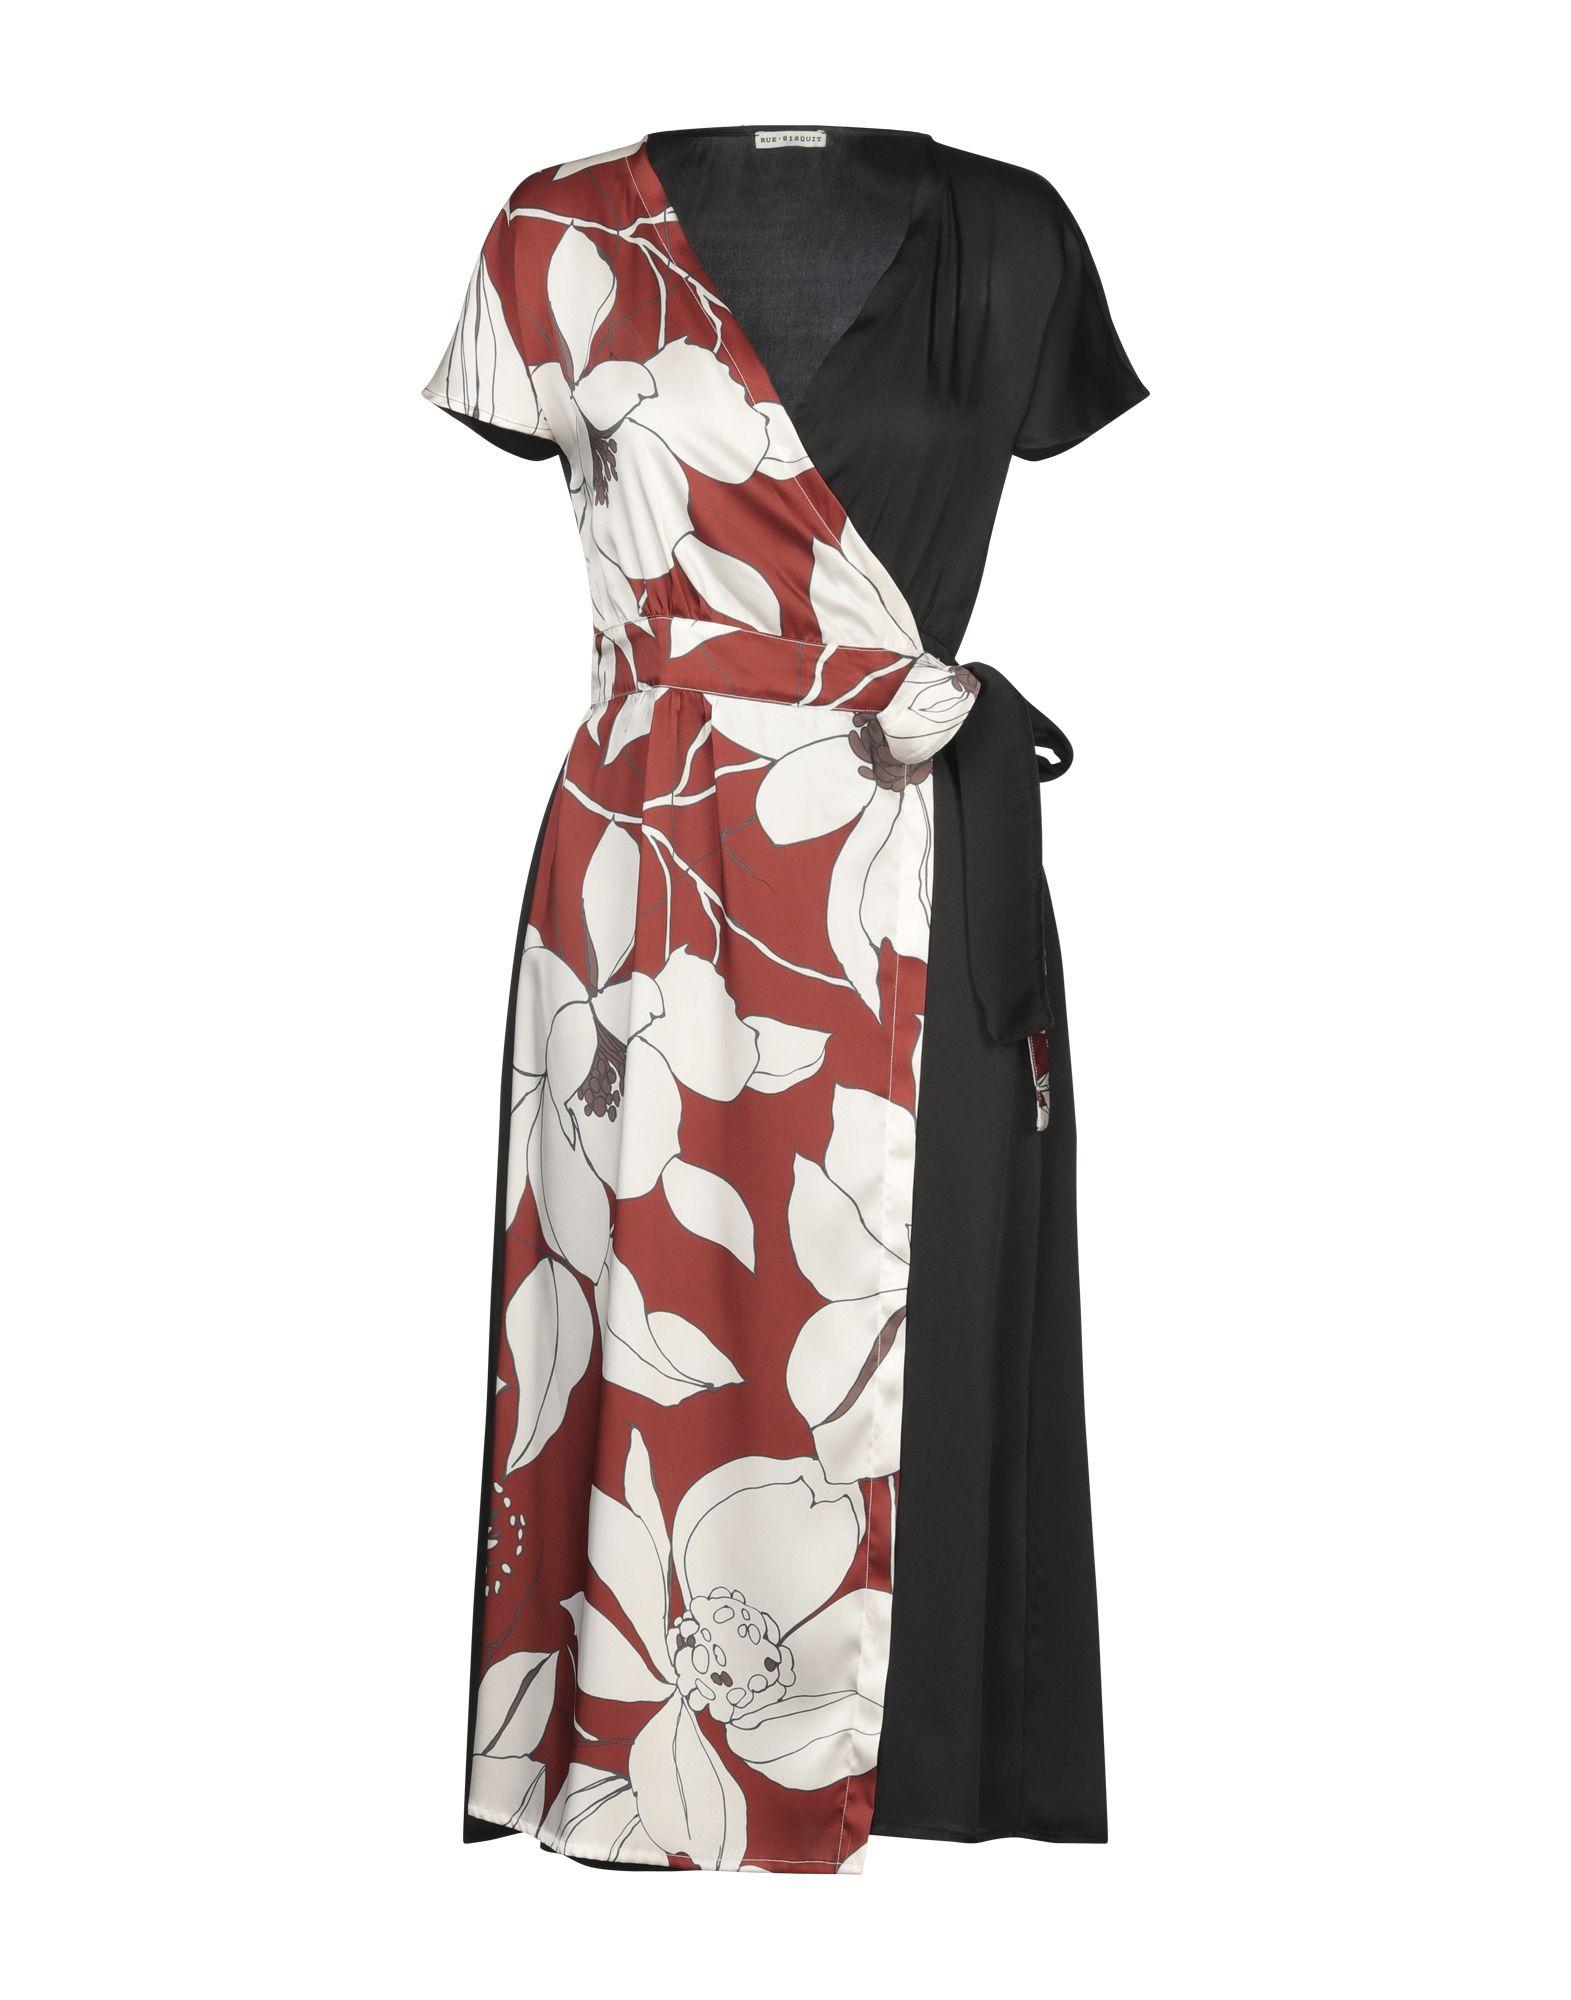 RUE•8ISQUIT Платье длиной 3/4